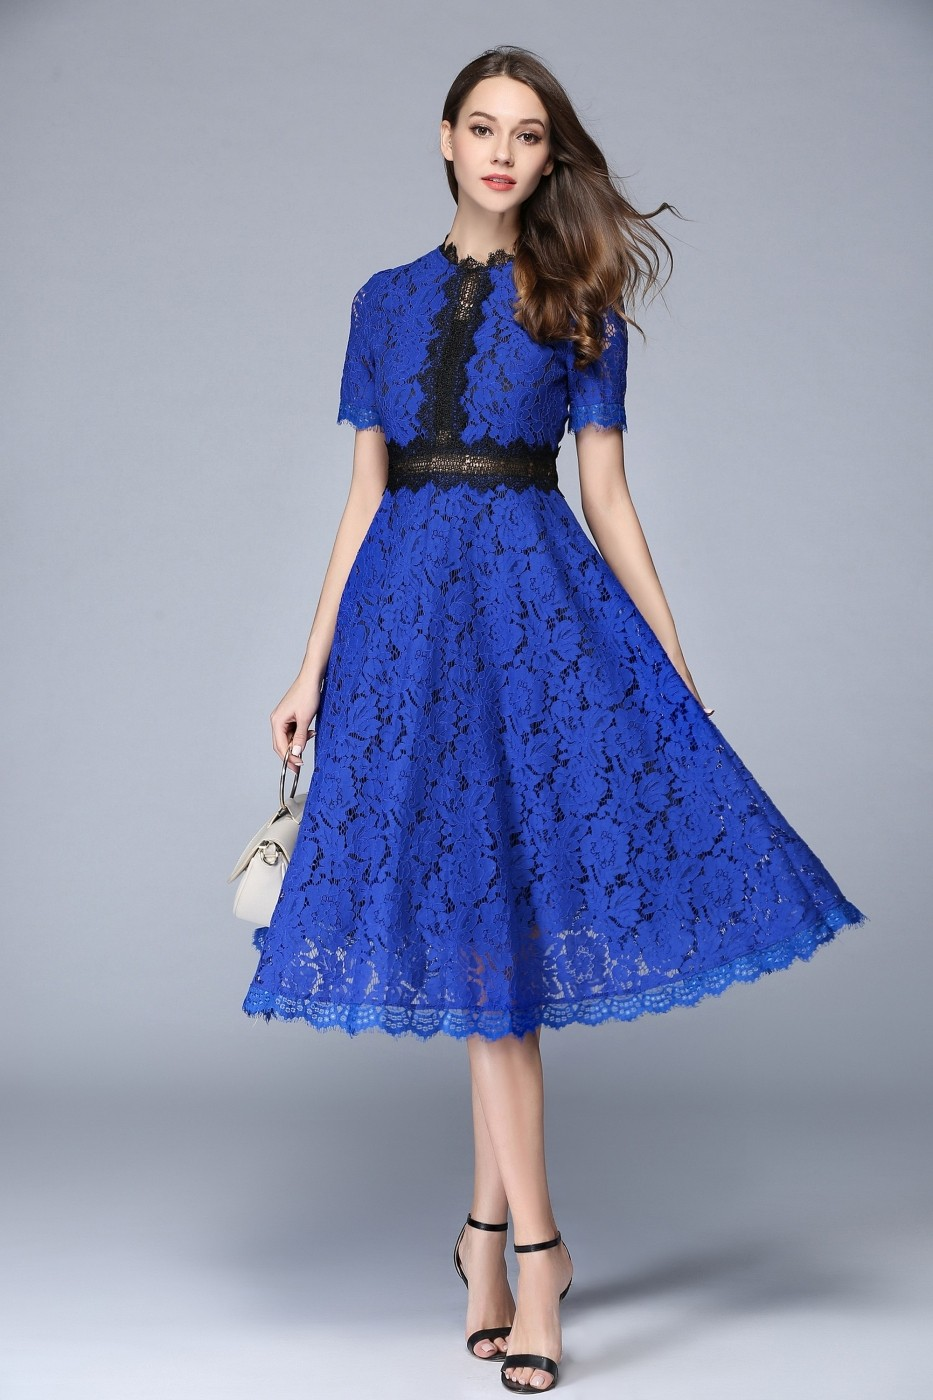 c4ecc422a4 Kaimilan Estélyi ruha ATL-QB545_Blue_els Kék - FashionUP!